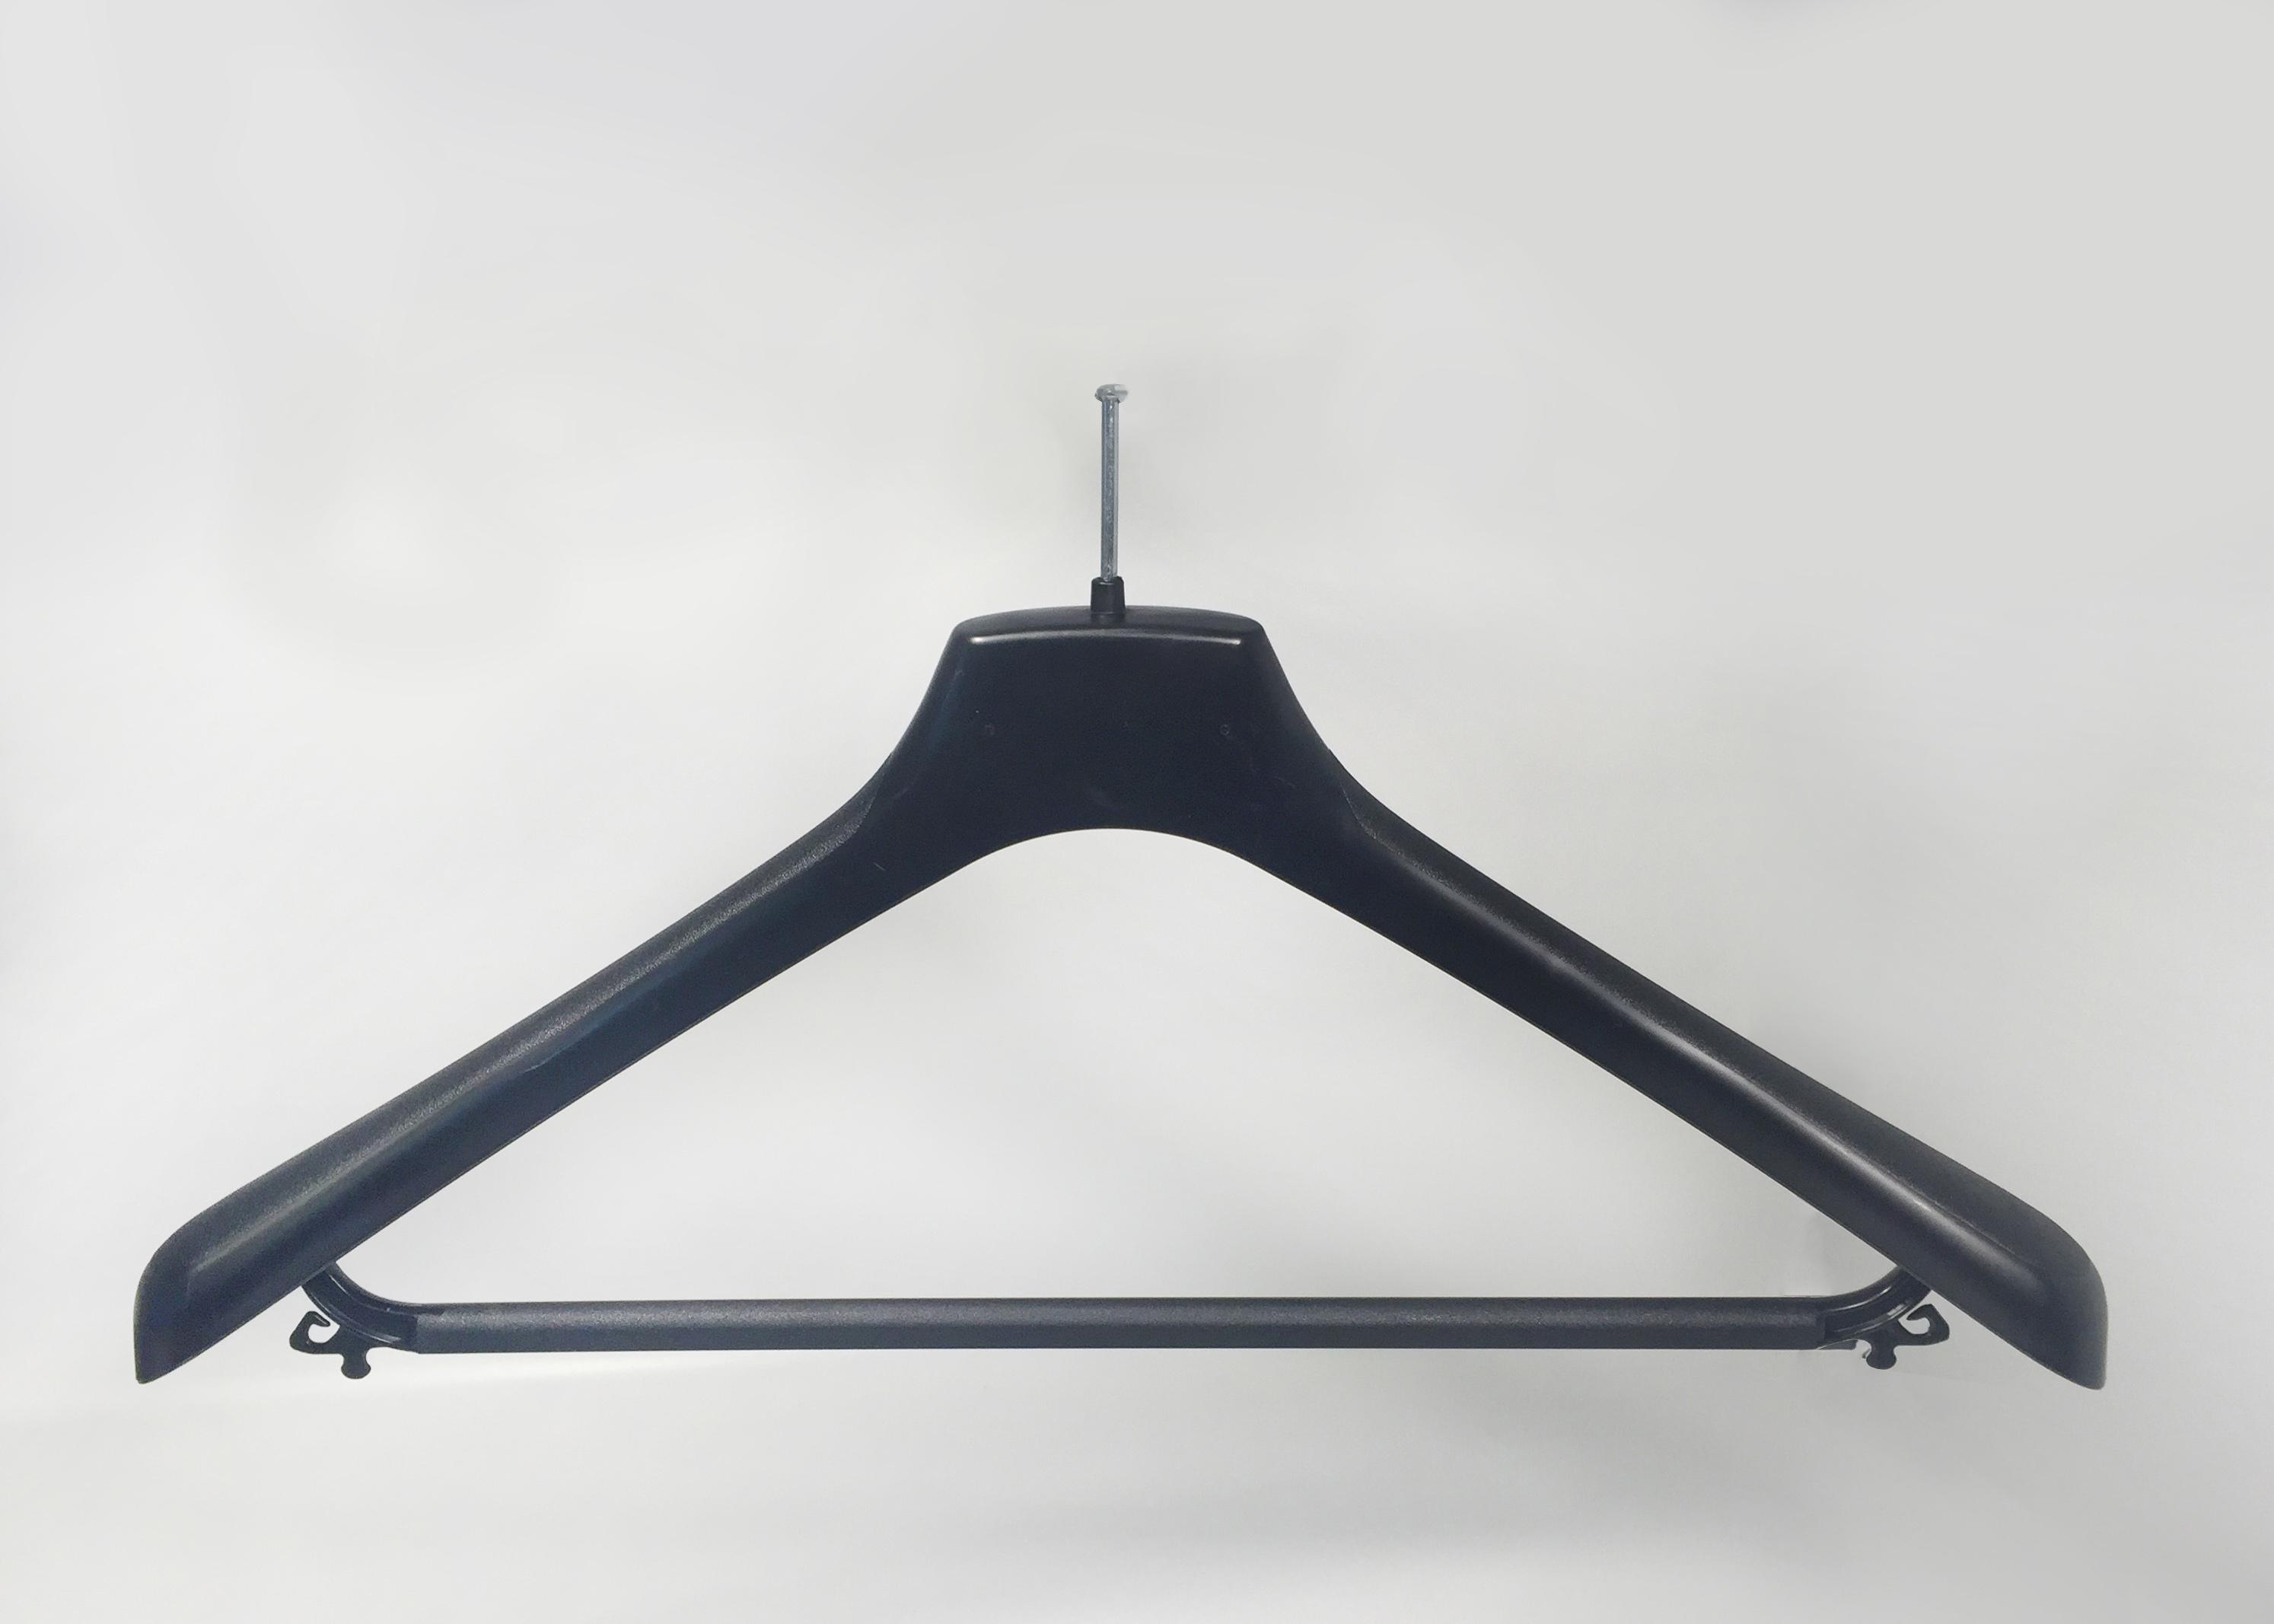 BLACK PLASTIC HANGER WITH ANTI-THEFT HOOK